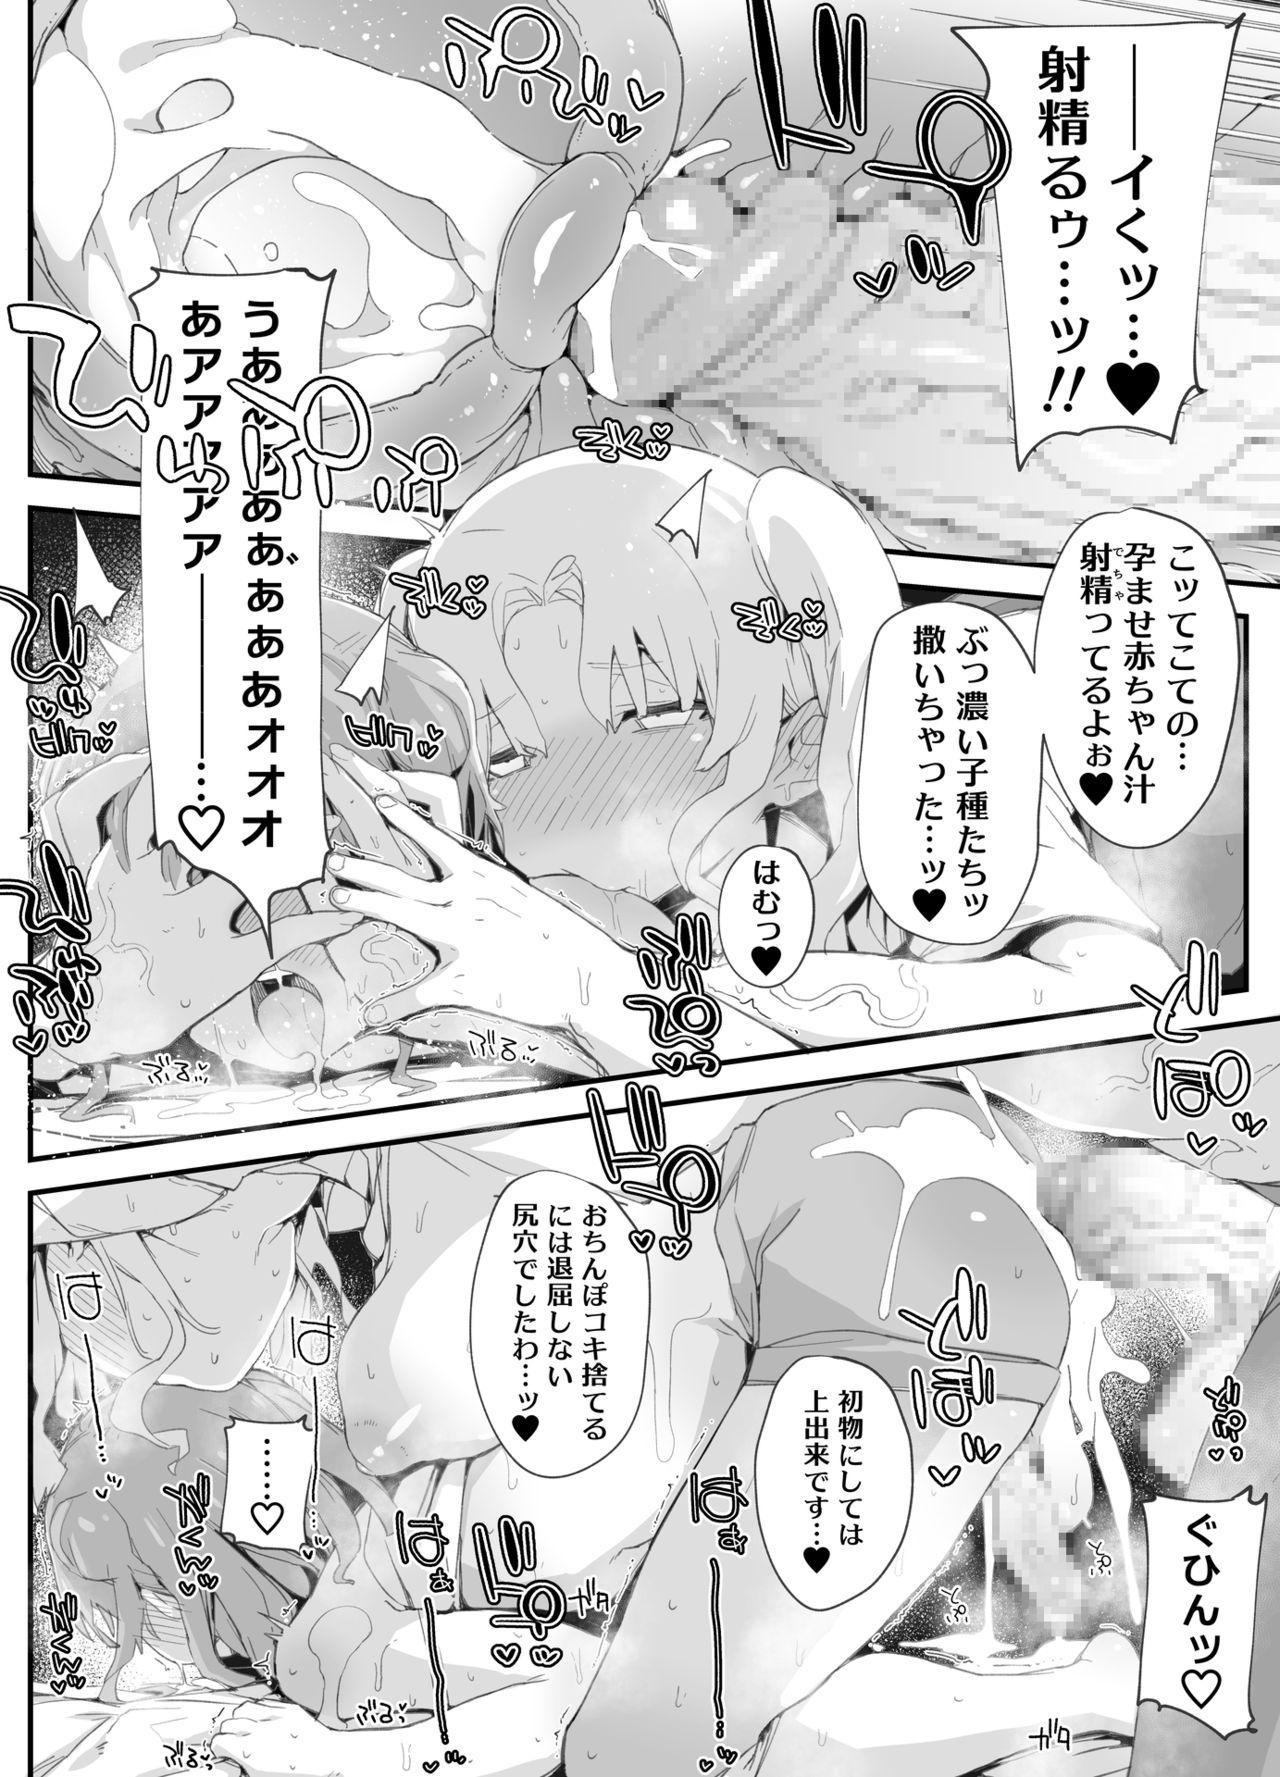 Futanari Onee-san ni Wakarasareta Otokonoko 26